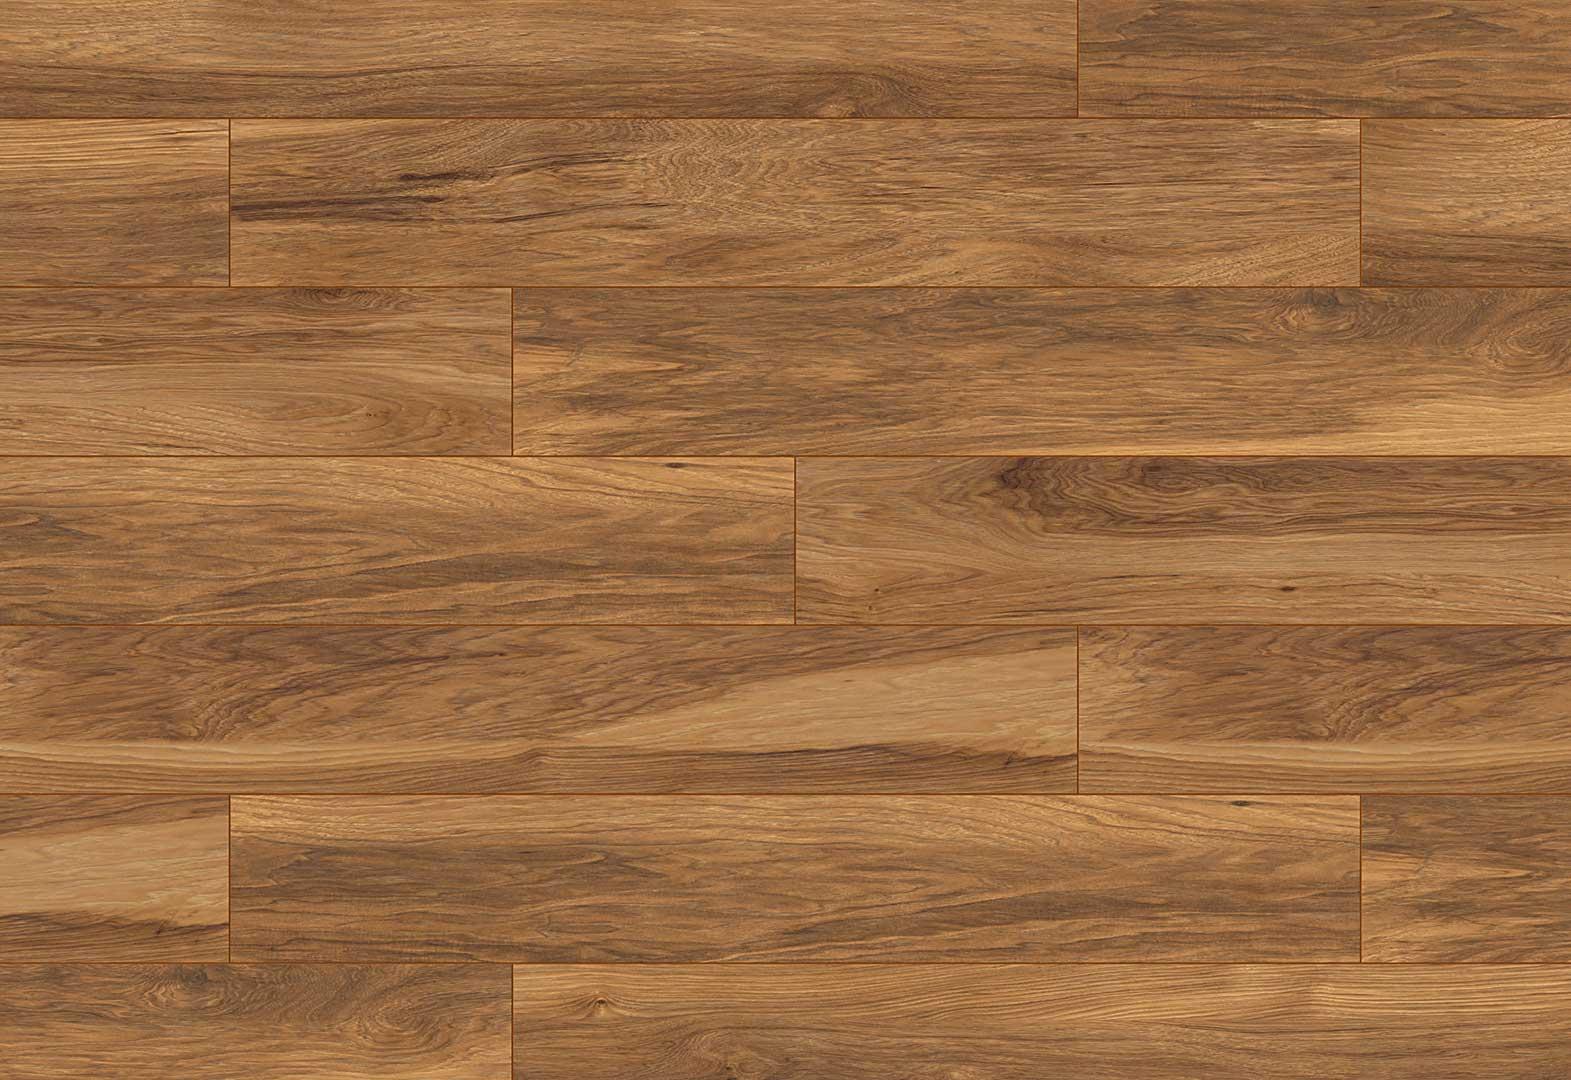 Handscraped Laminate Floors Appalachian Hickory